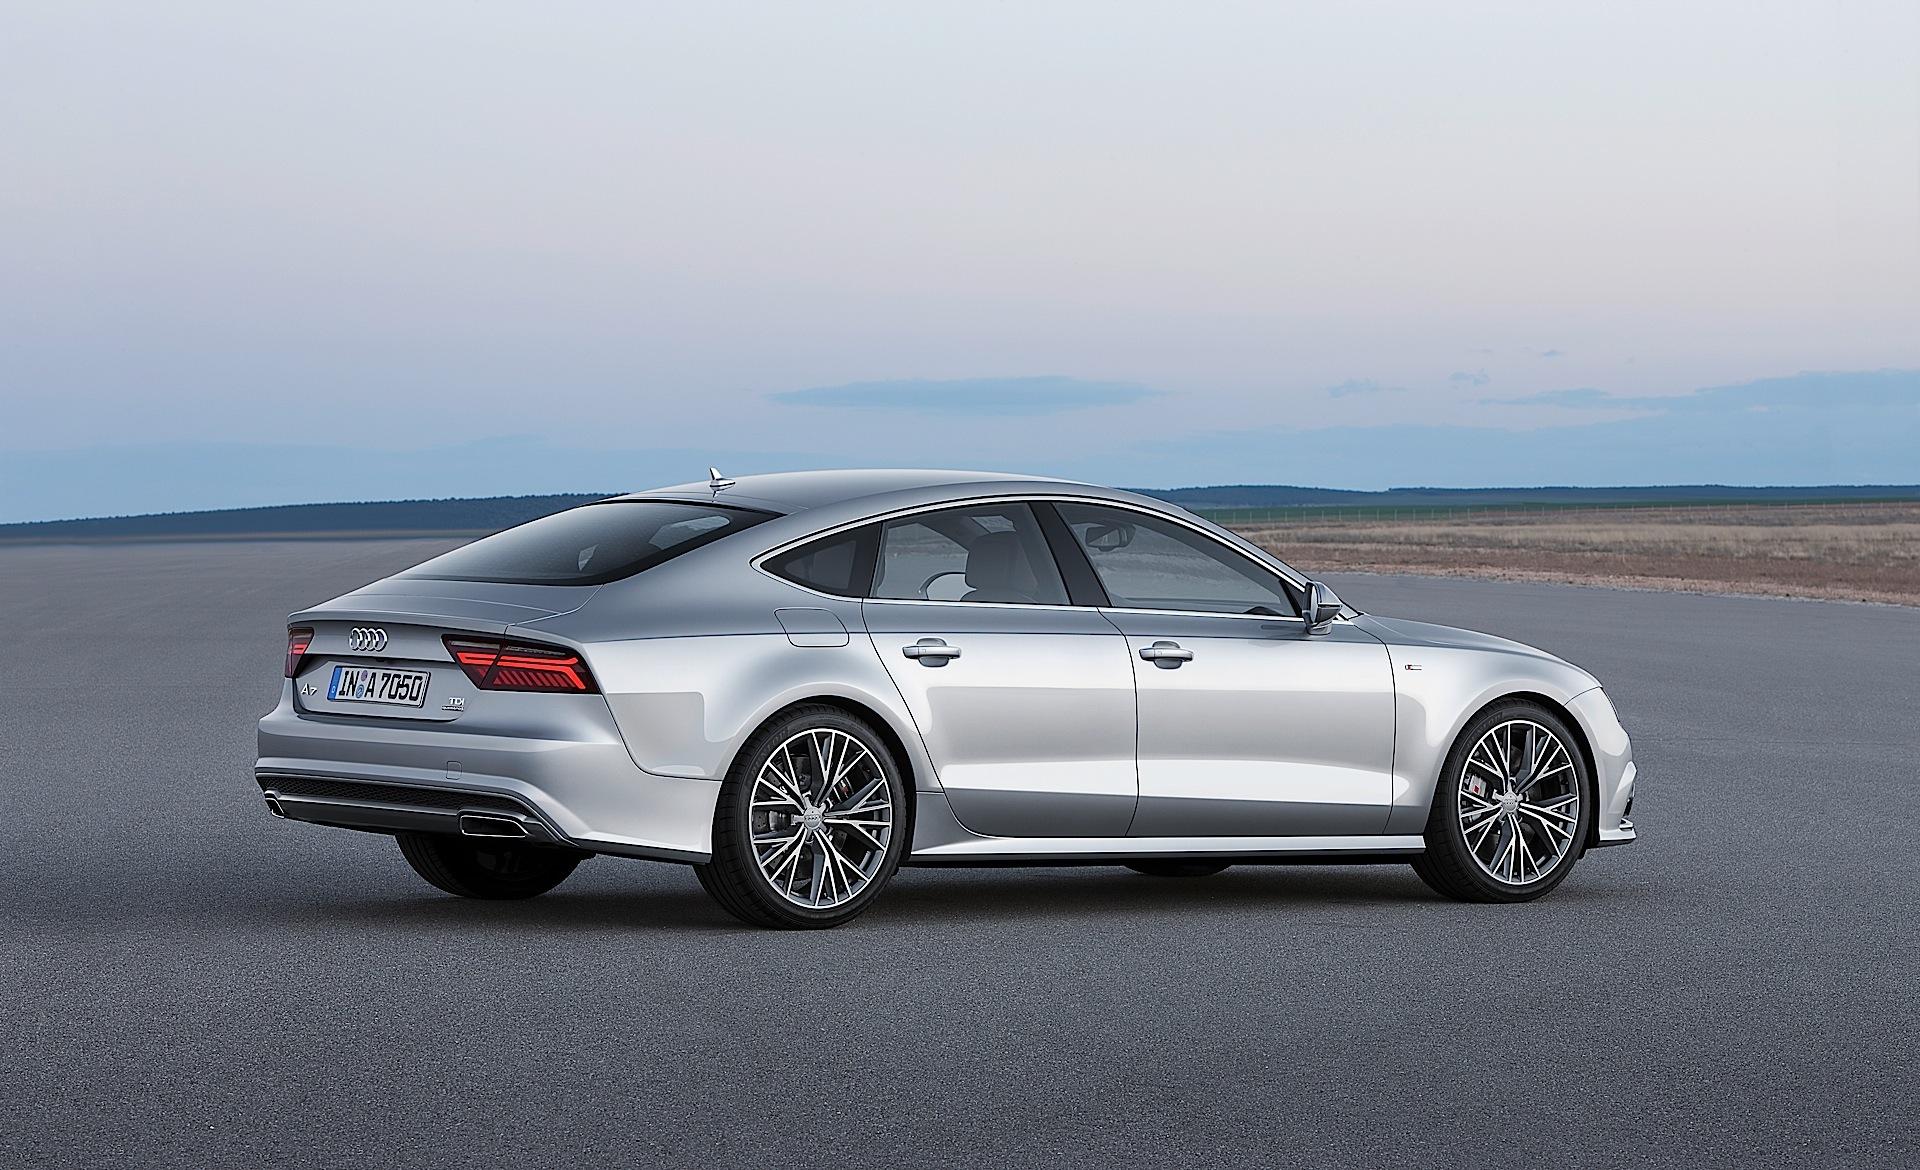 2017 Audi A7 >> AUDI A7 Sportback specs - 2014, 2015, 2016, 2017 - autoevolution